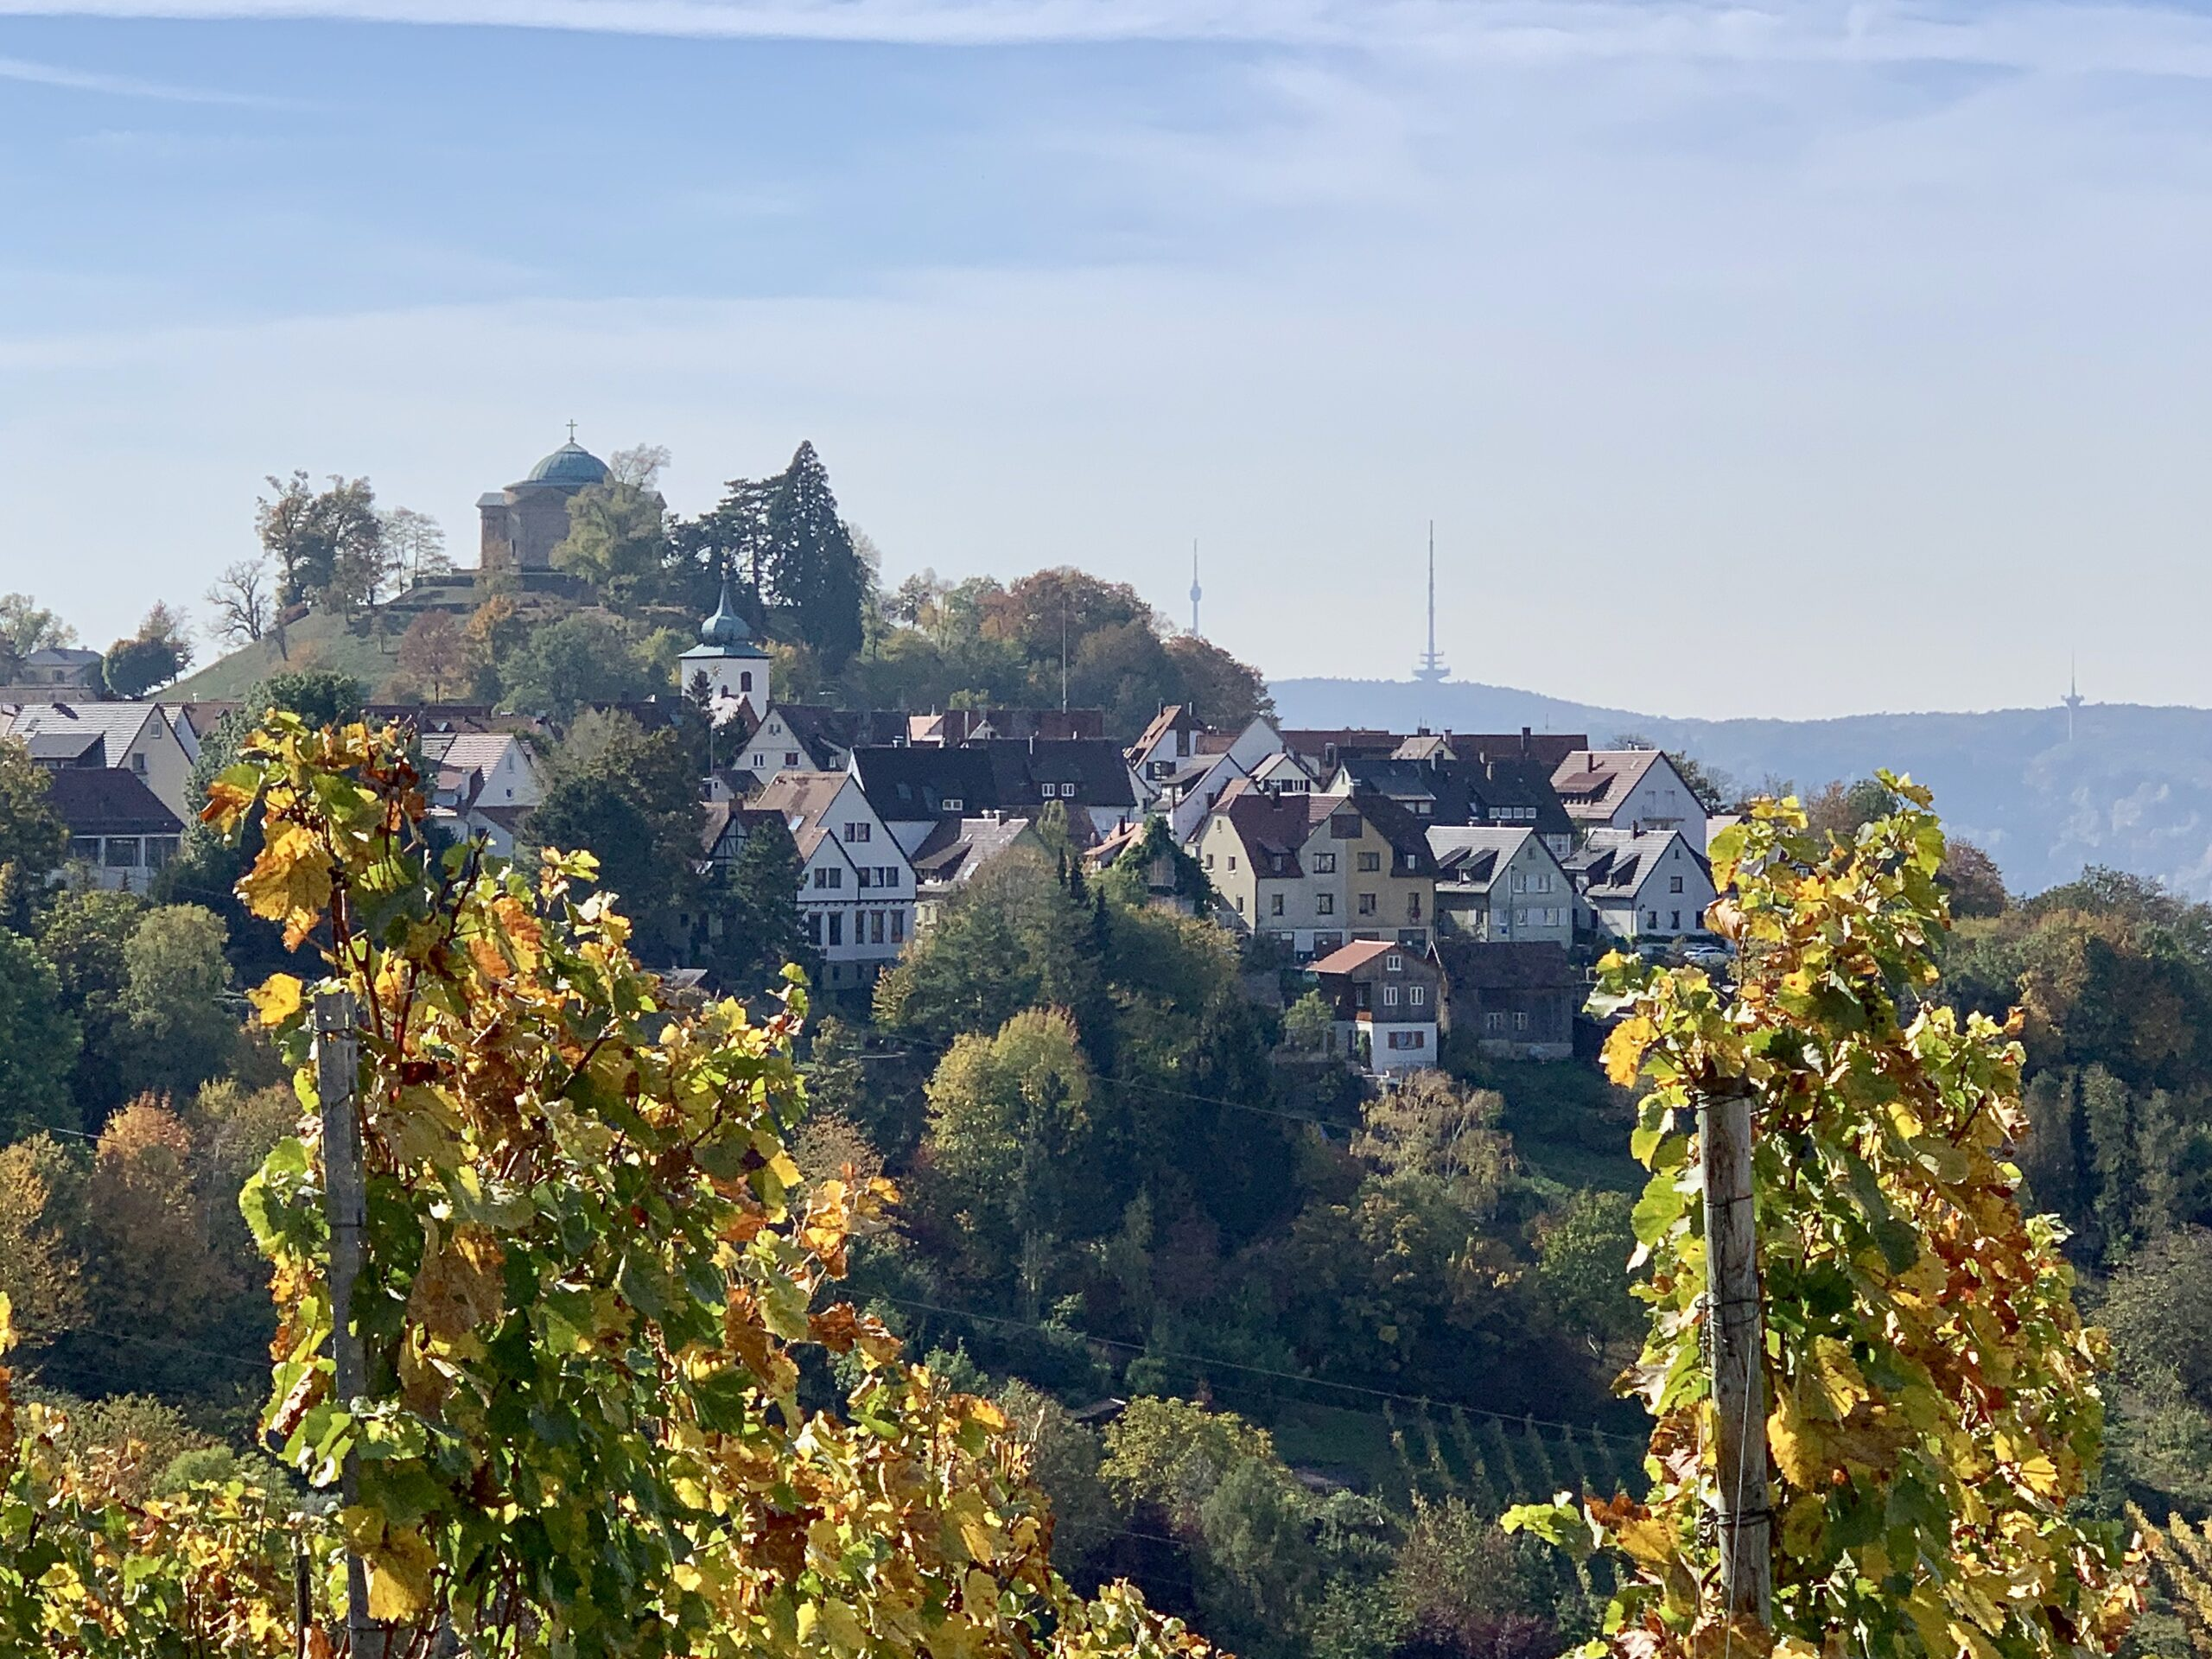 Radtour nach Rotenberg